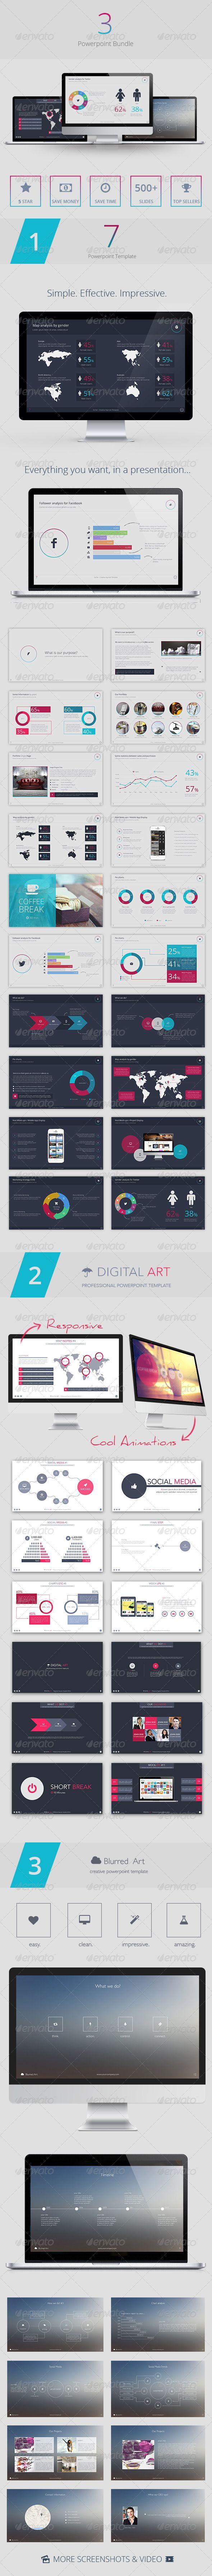 20 best keynote/ powerpoint templates images on pinterest, Presentation templates